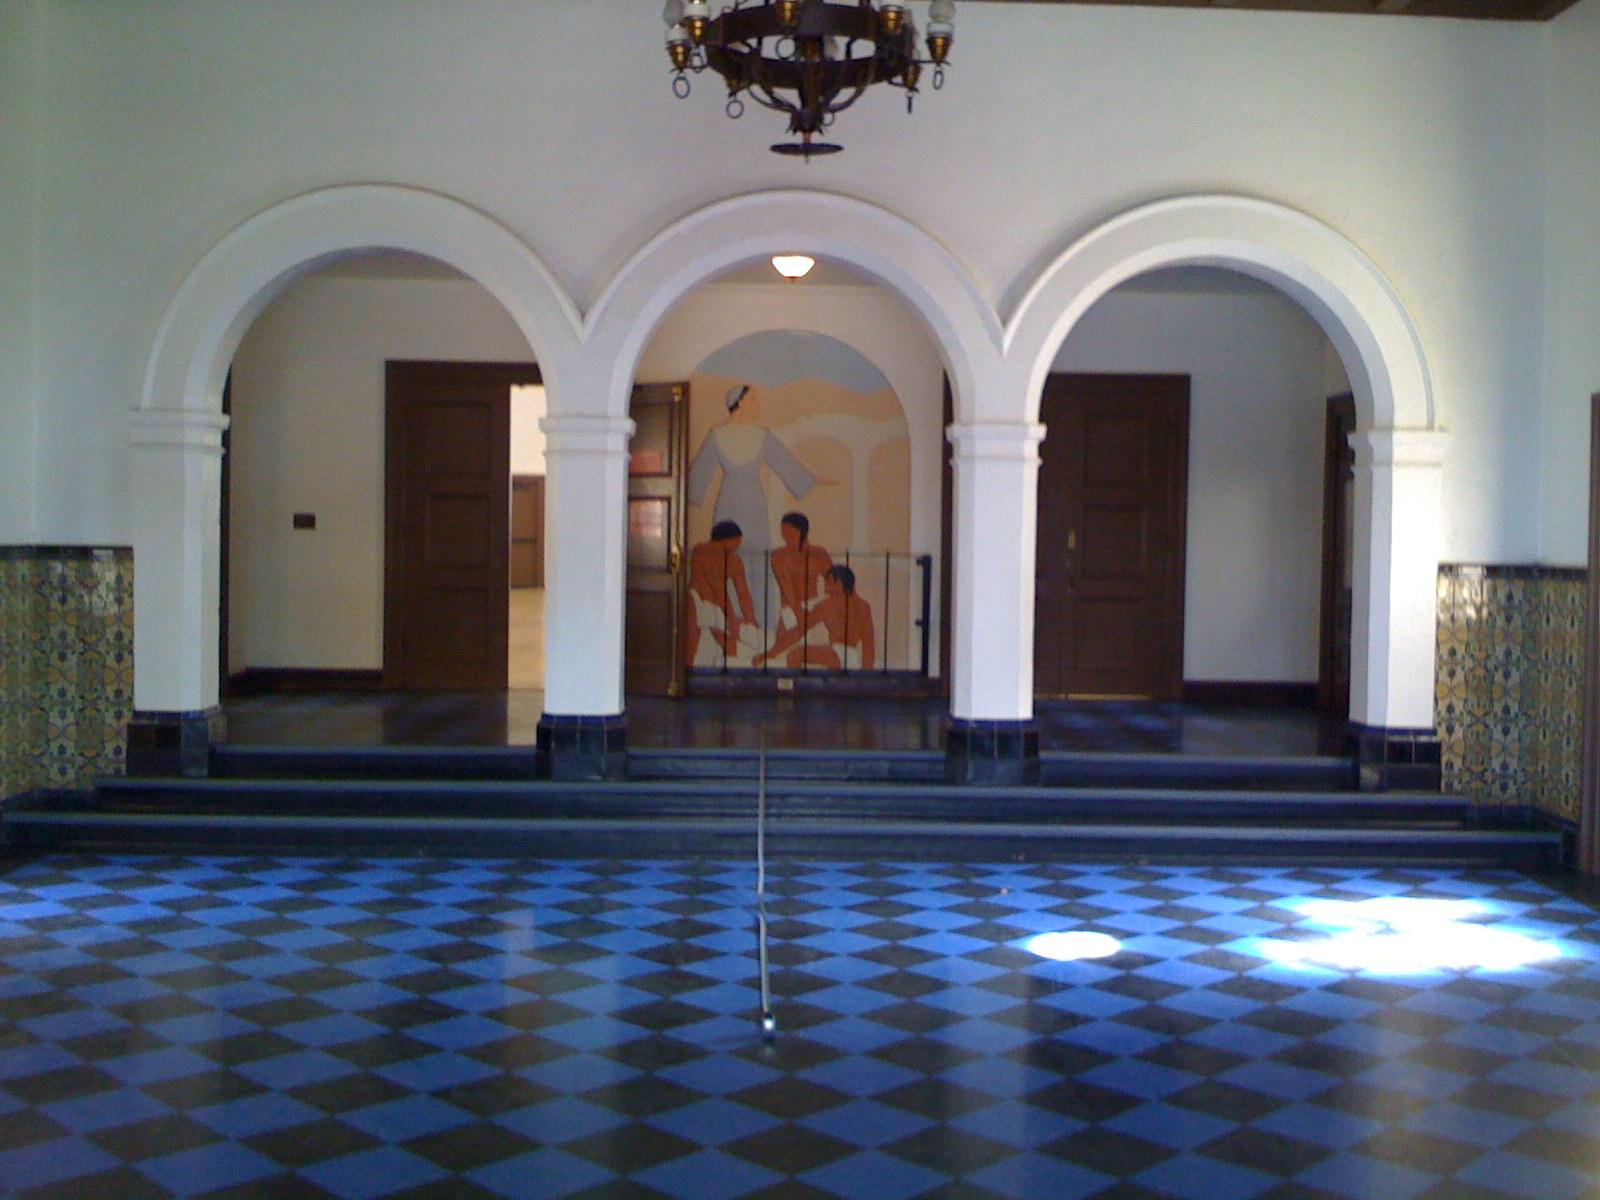 Print Photos | View Full-Size Image & Lompoc Veterans Memorial Building